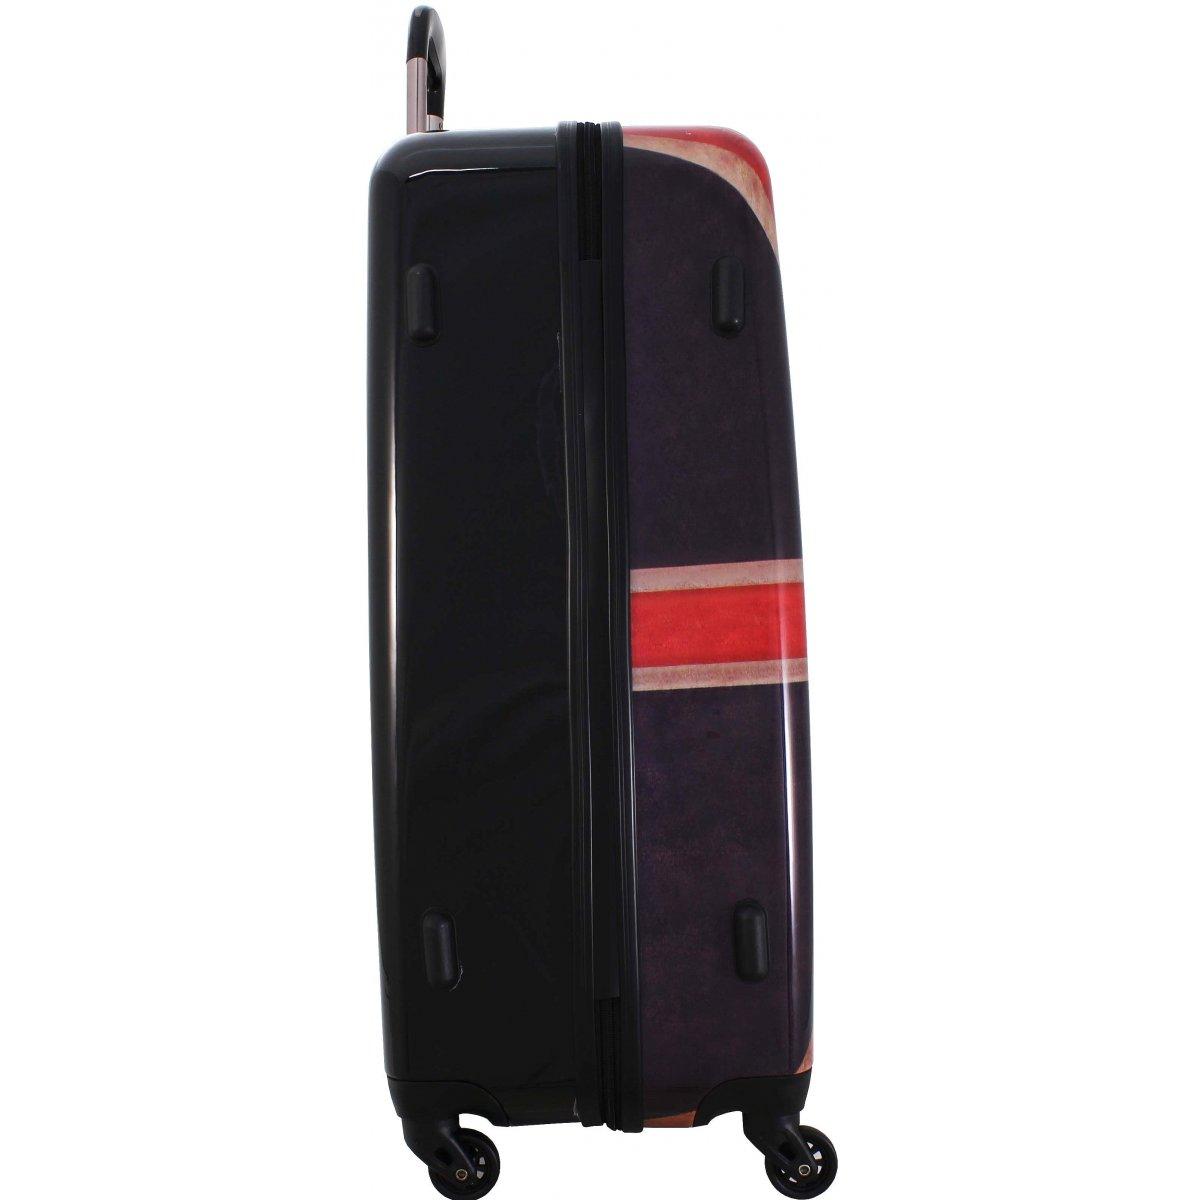 valise rigide david jones 76cm ba20571g couleur principale drapeau uk solde. Black Bedroom Furniture Sets. Home Design Ideas